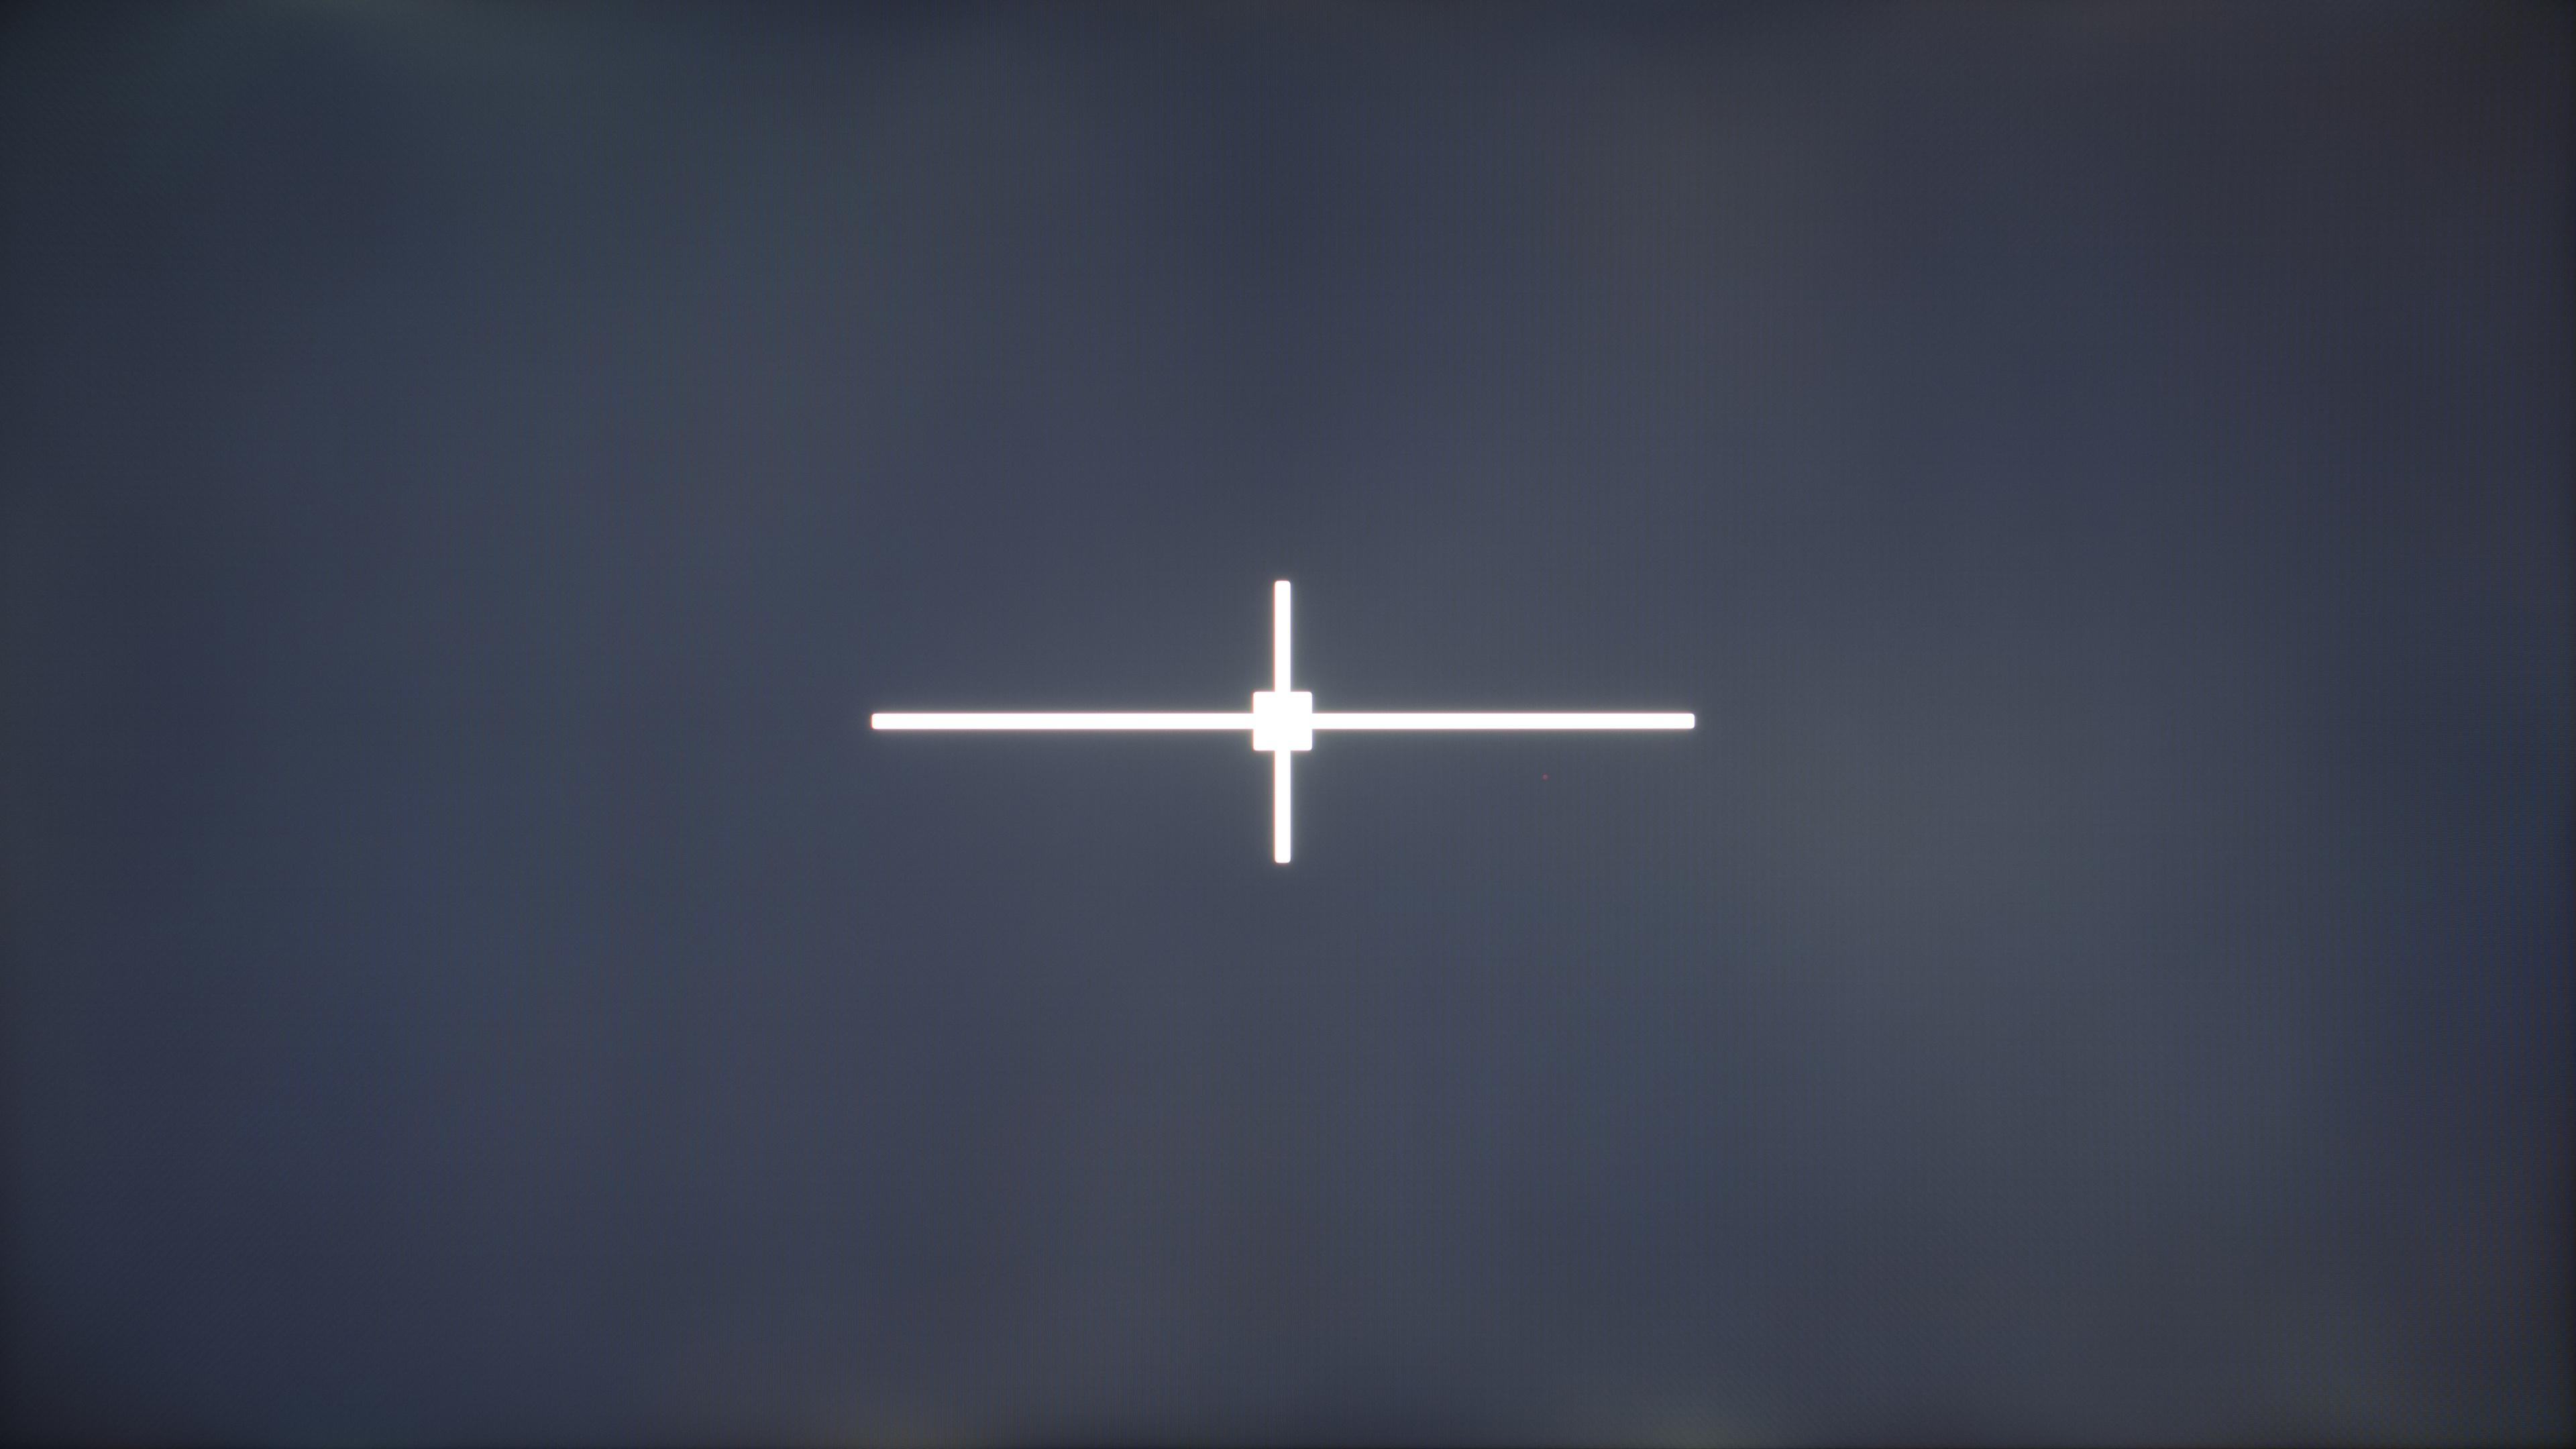 http://i.rtings.com/images/reviews/j5000/j5000-uniformity-large.jpg